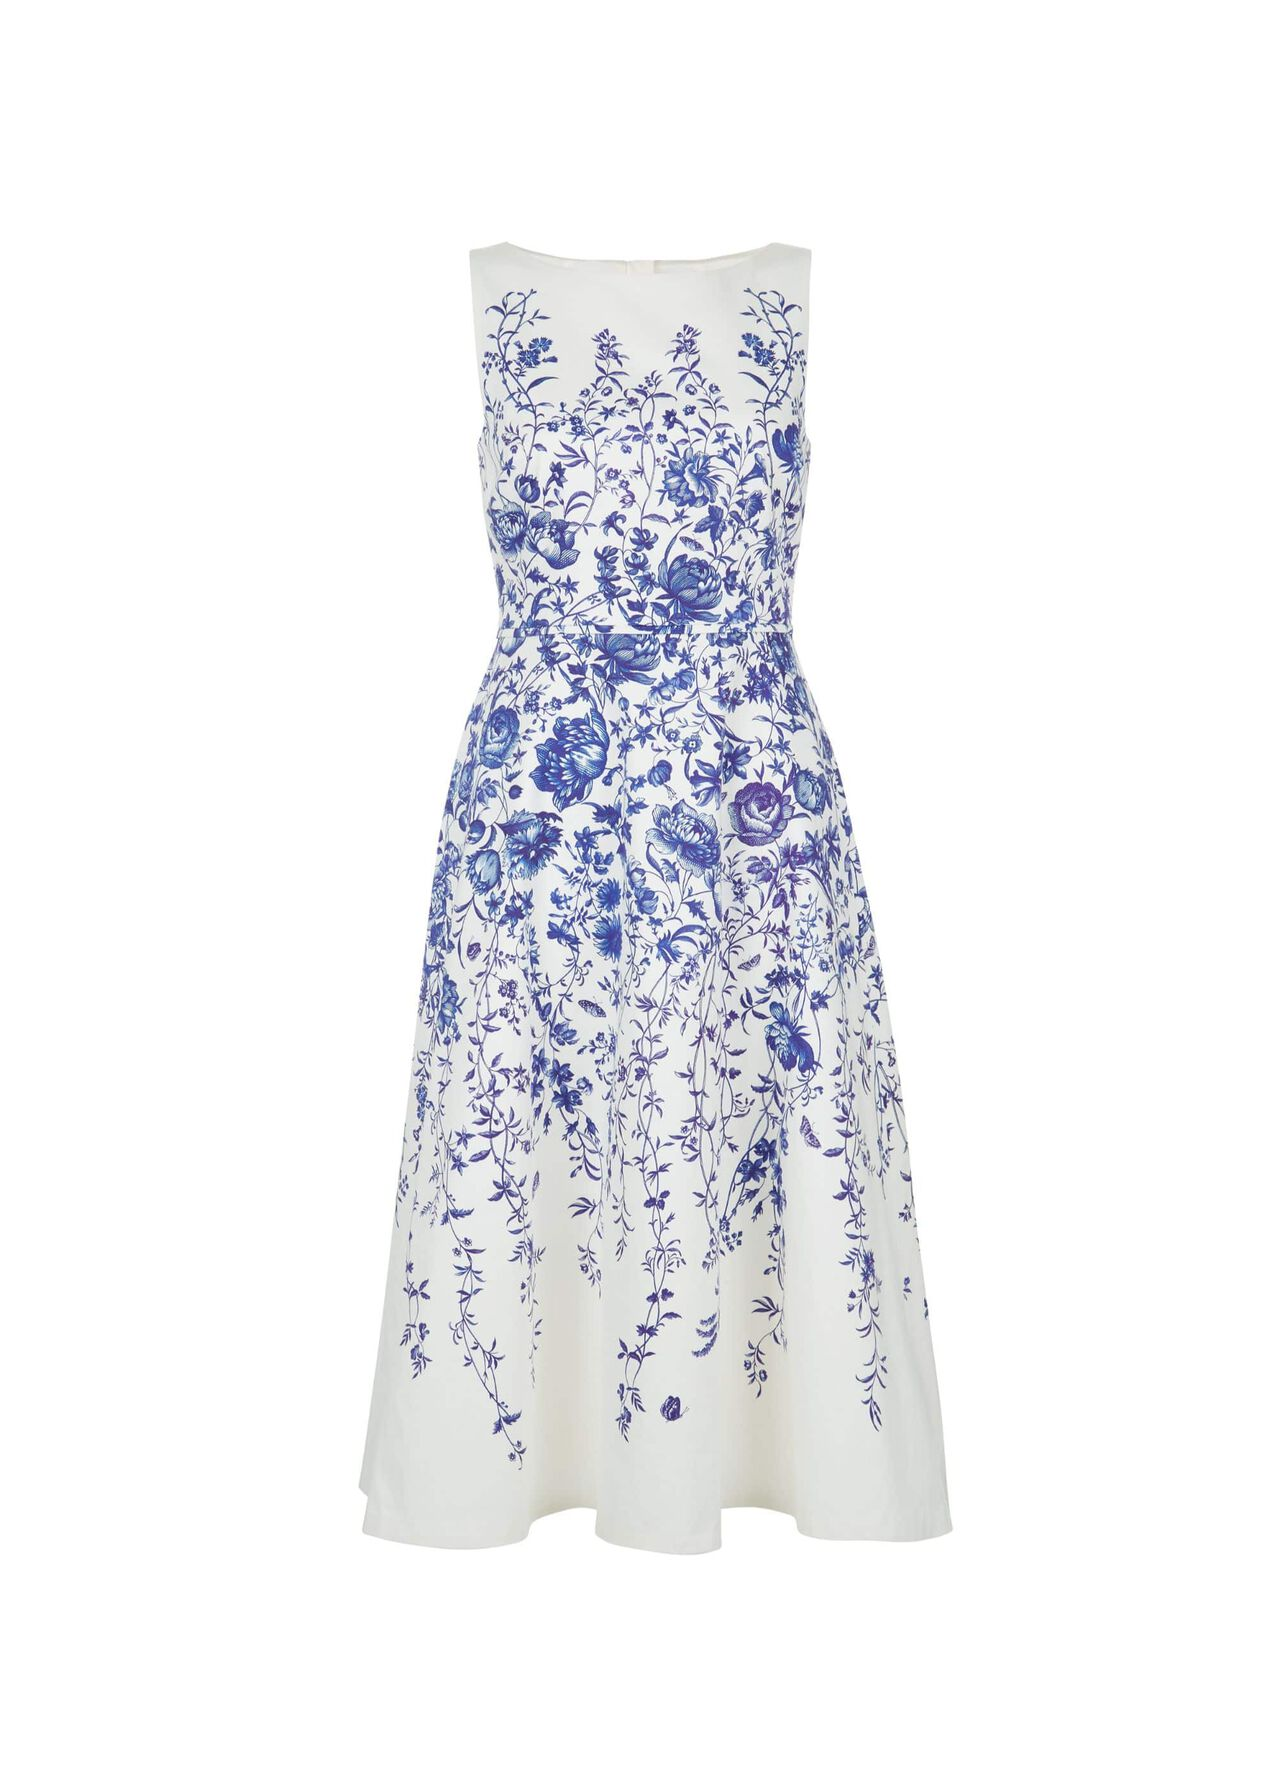 Evelyn Dress Ivory Blue